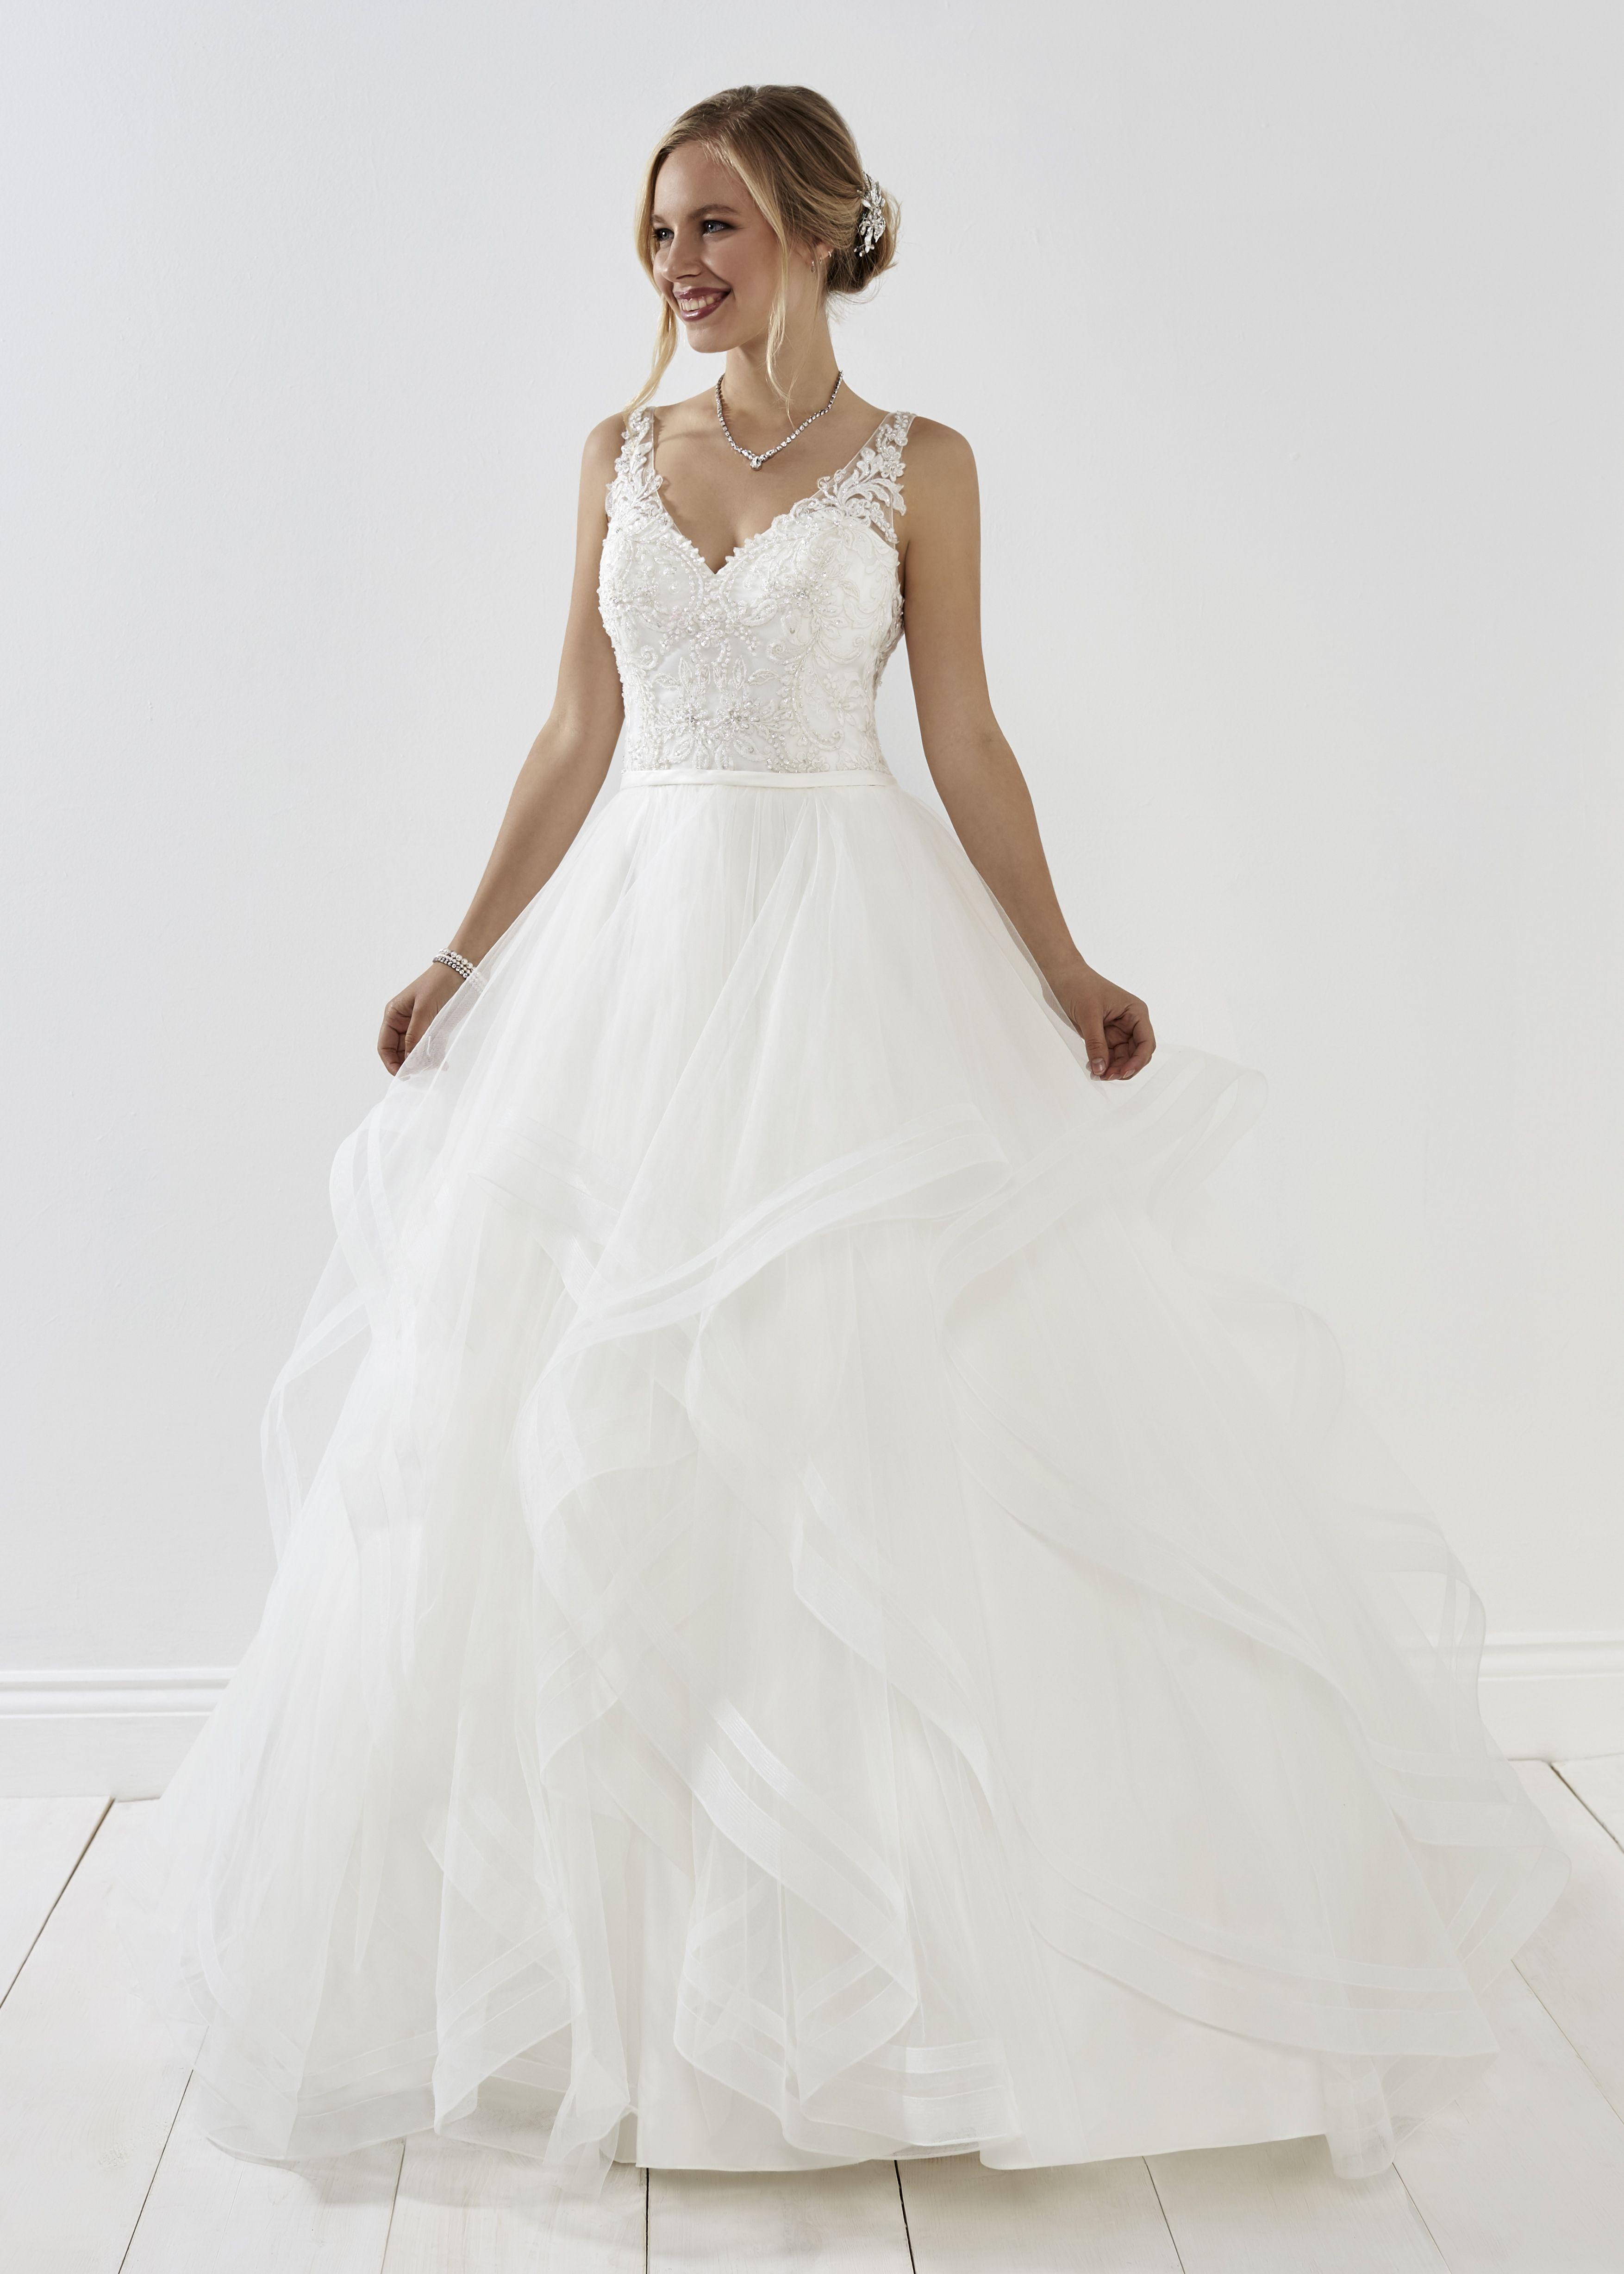 cc6b1d706a Solange in Ivory #romantica #newcollection #bridal #bride #bridestyle # wedding #lace #ballgown #ruffleskirt #princessdress